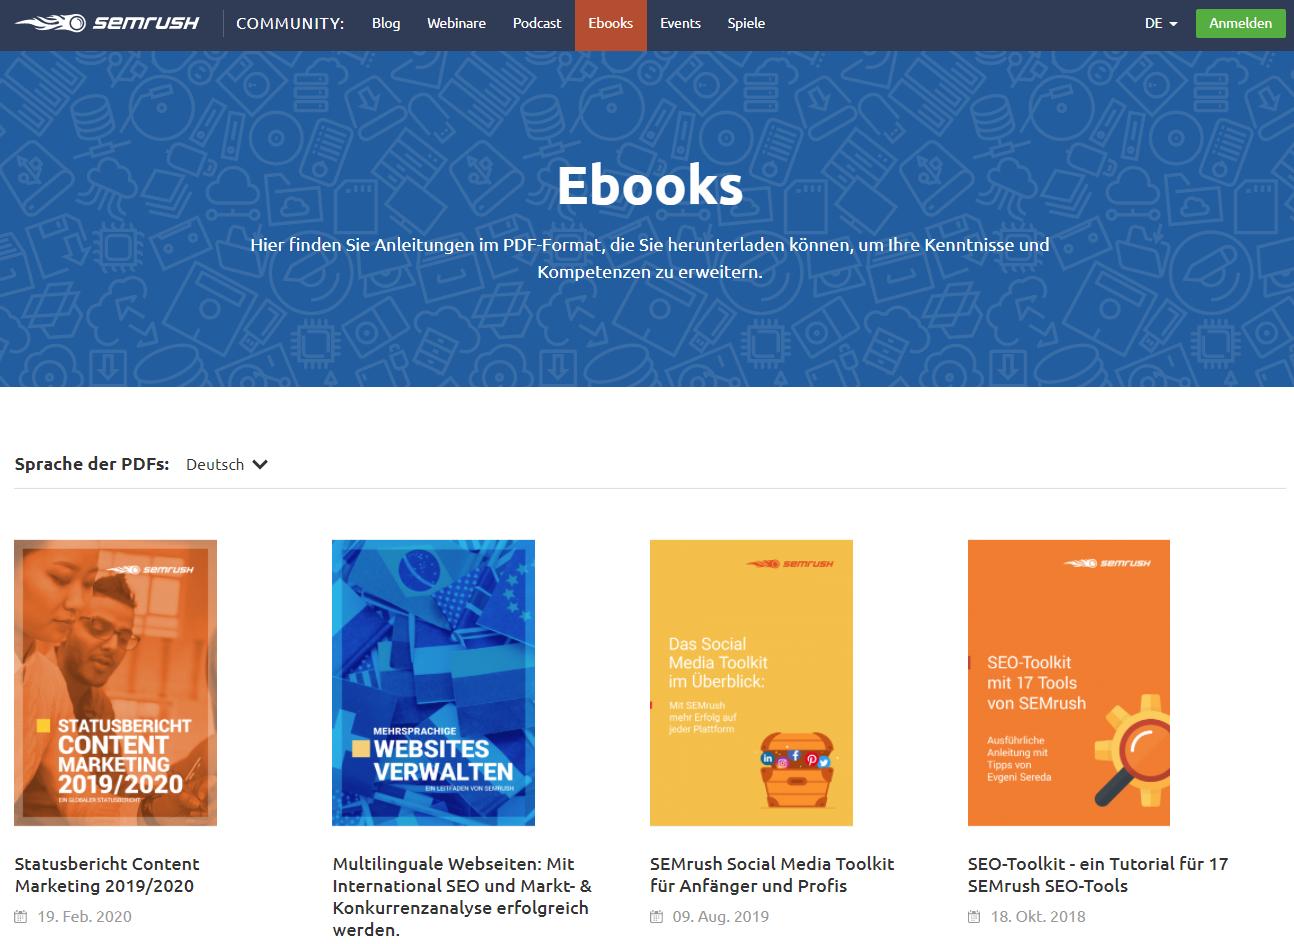 E-Books auf der SEMrush-Website